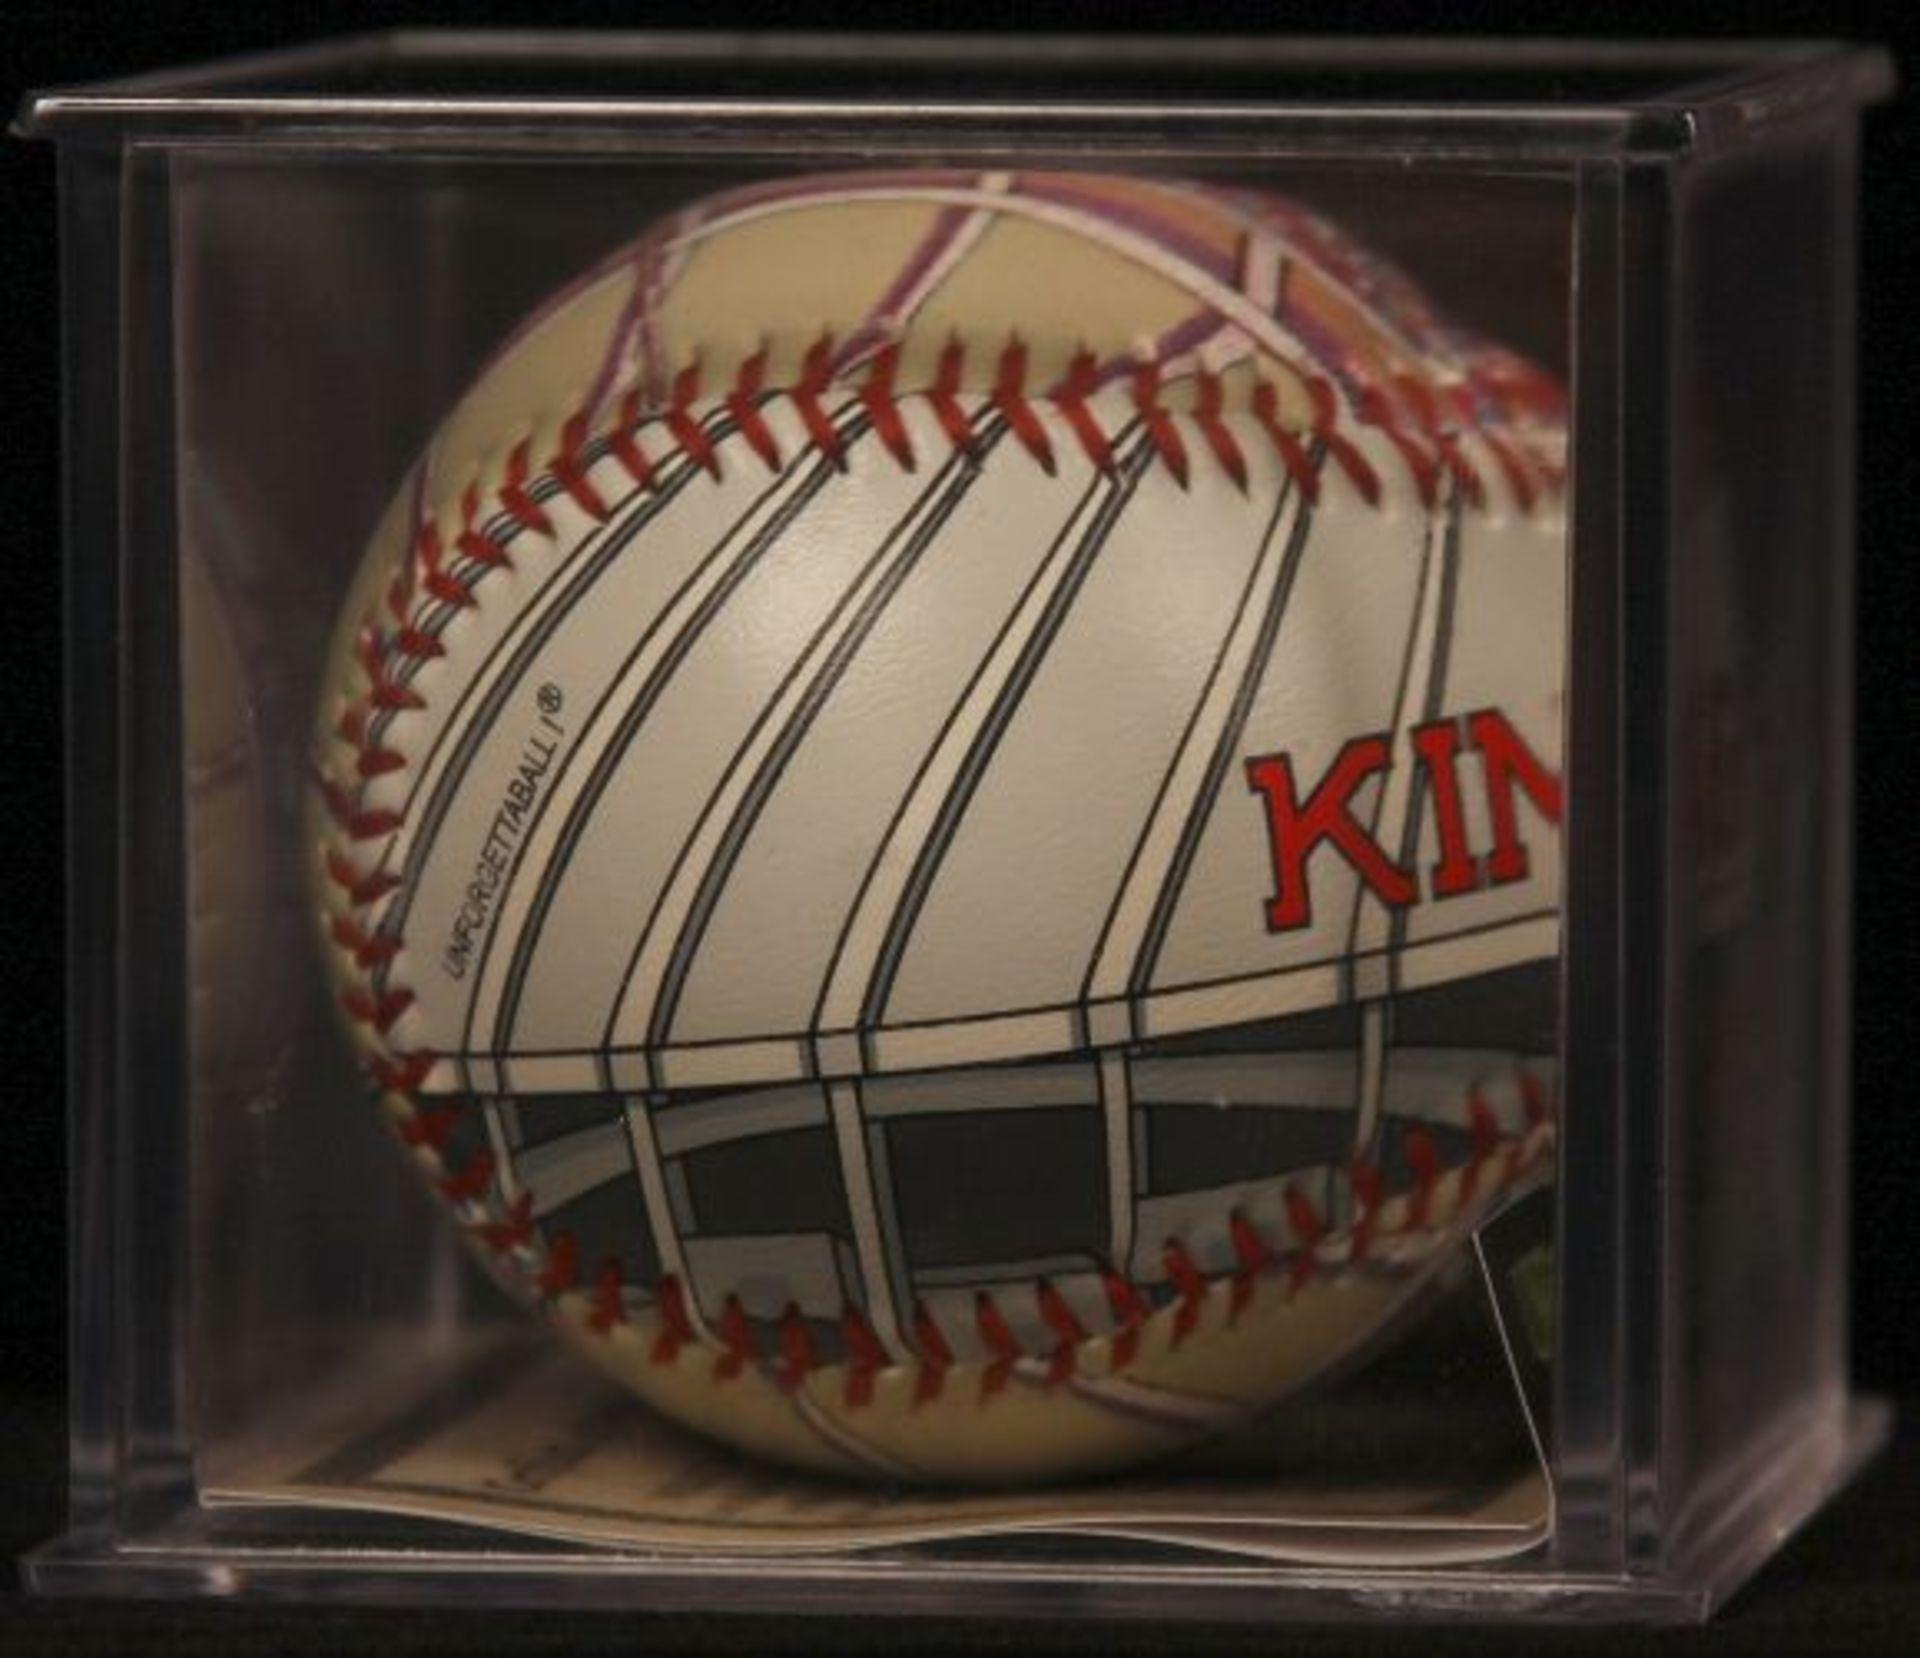 "Unforgettaball! ""Kingdome"" Collectable Baseball - Image 2 of 6"